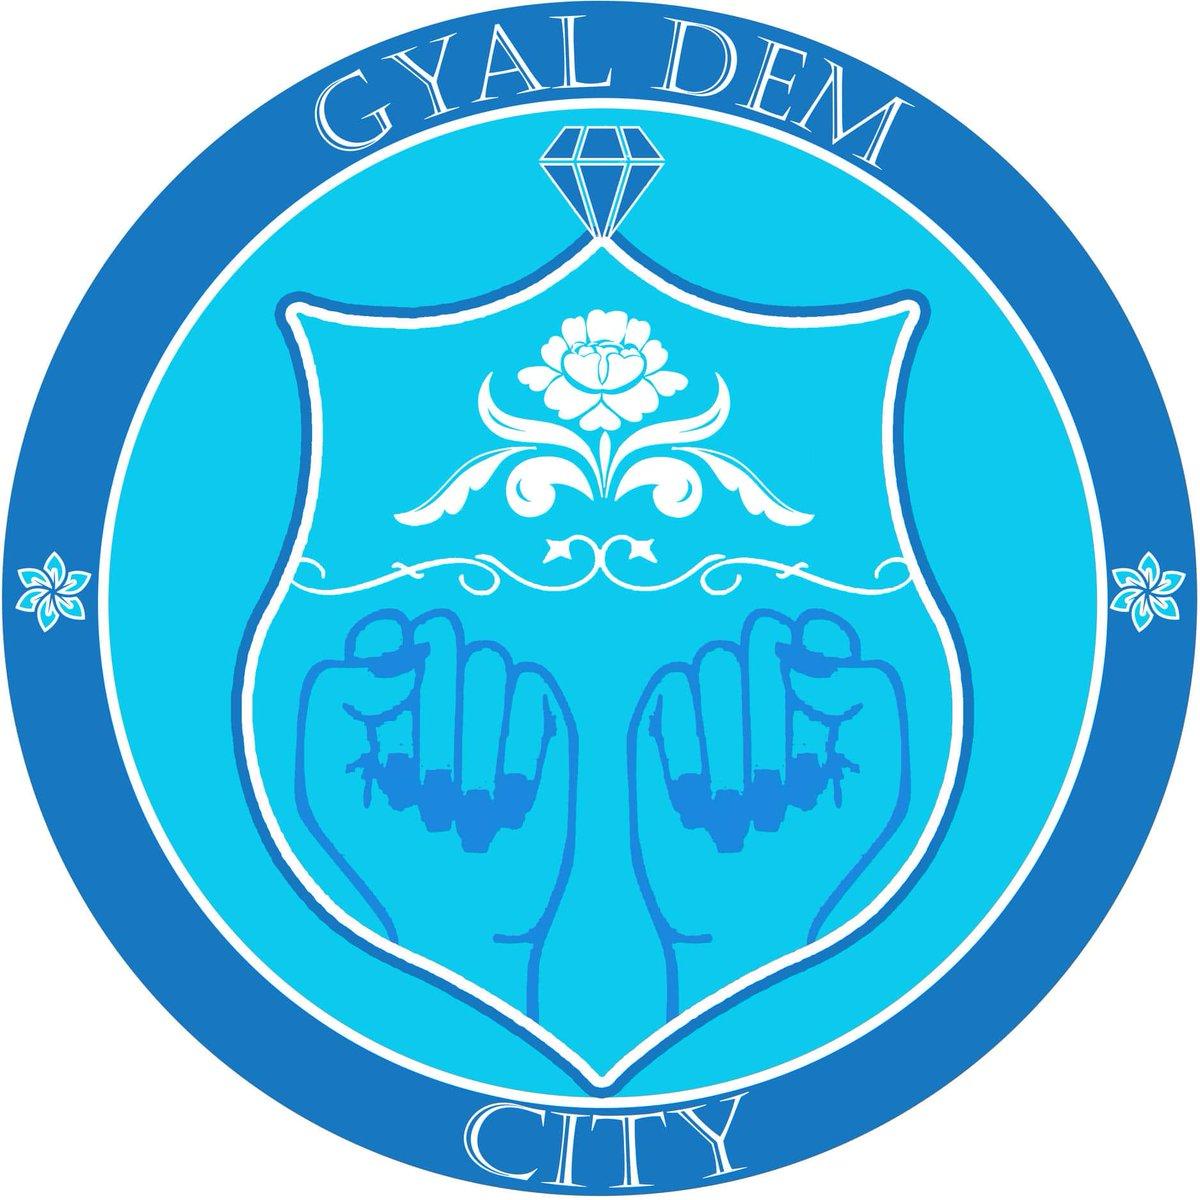 Latest GyalDem City Podcast - MANCHESTER CITY VS CRYSTAL PALACE PREVIEW - BRIGHTON RECAP    Hosts Yan City @Yannickaaa & @RoseMCFC   YouTube - https://t.co/Iwn9h69Isd  SoundCloud - https://t.co/Klsz3YGtg7 https://t.co/wTegdrzmTN